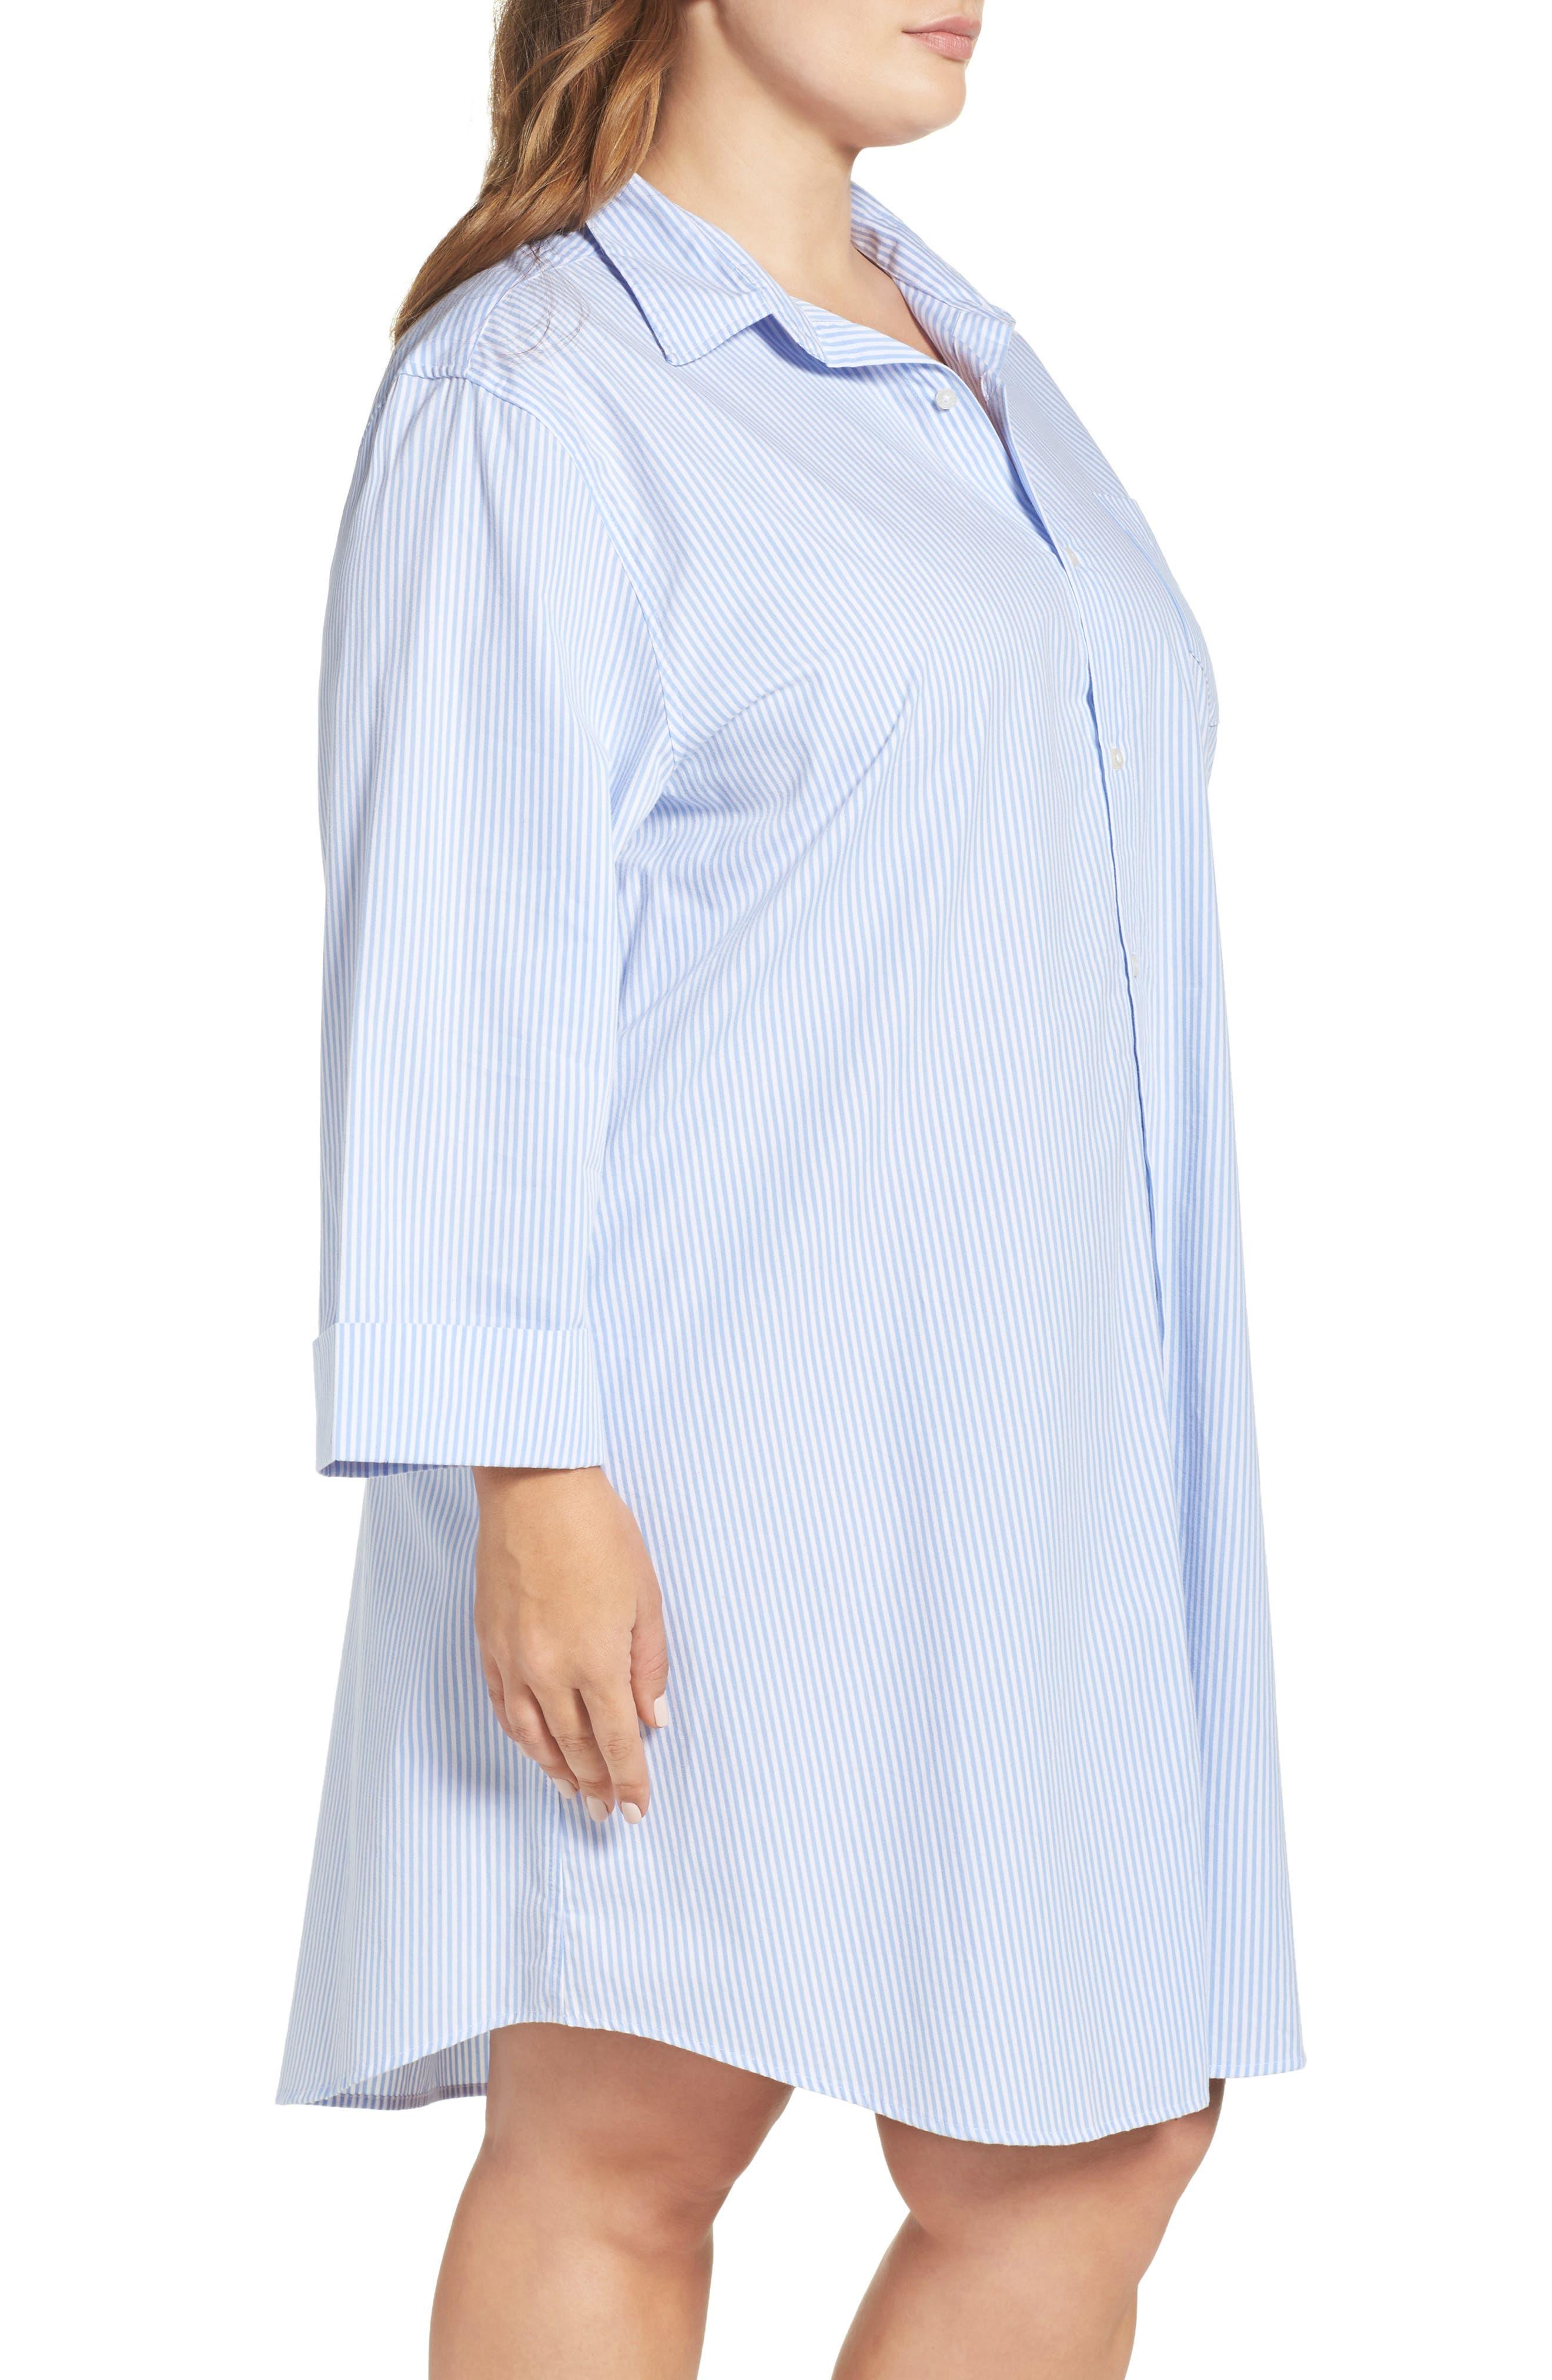 Sleep Shirt,                             Alternate thumbnail 3, color,                             Stripe French Blue/ White